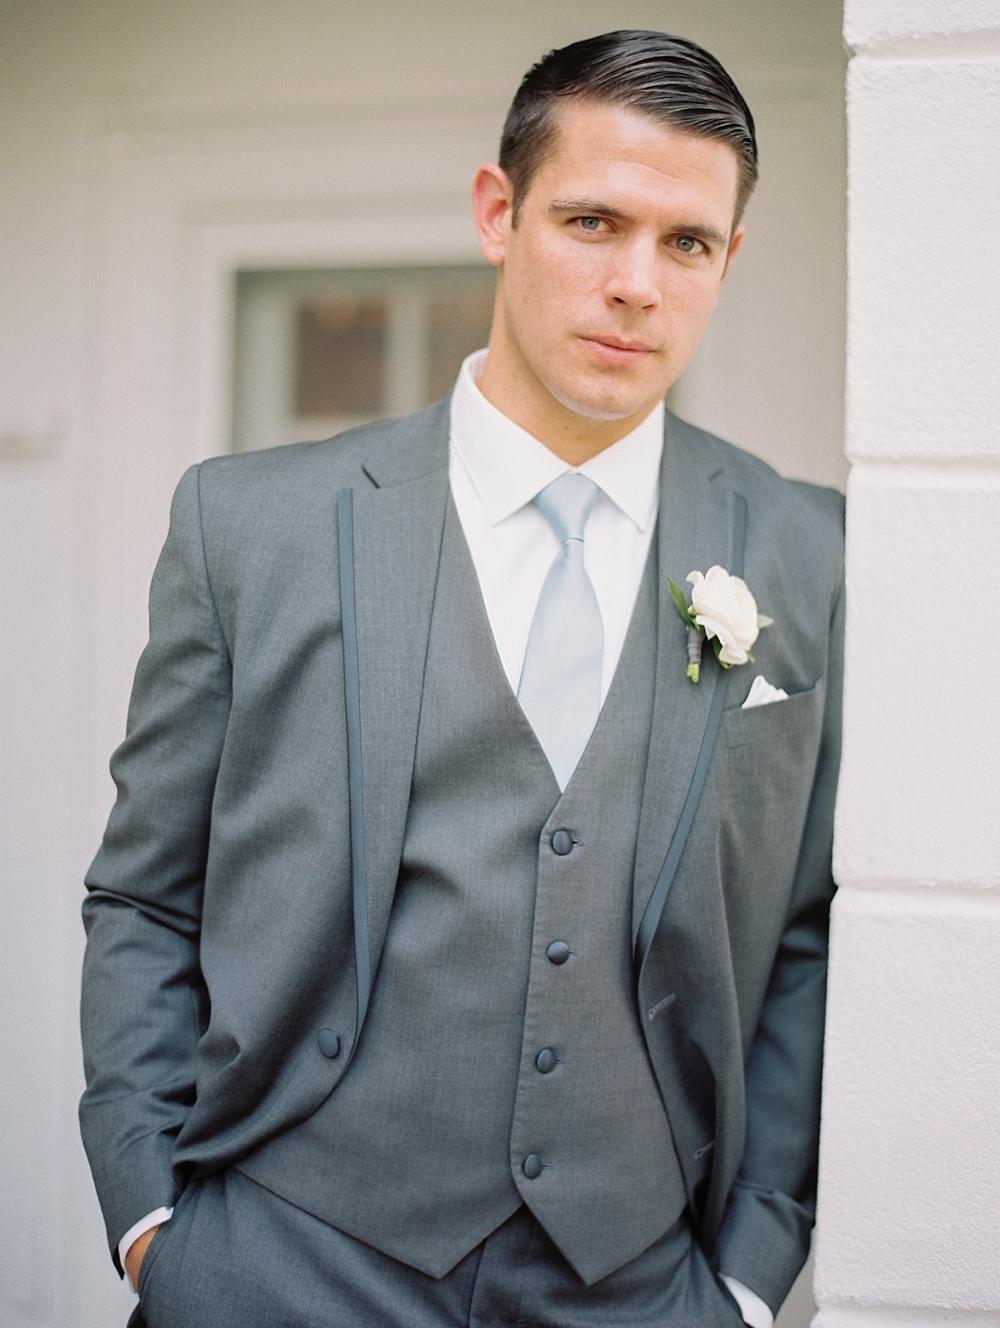 kristin-la-voie-photography-lehmann-mansion-wedding-photographer-261